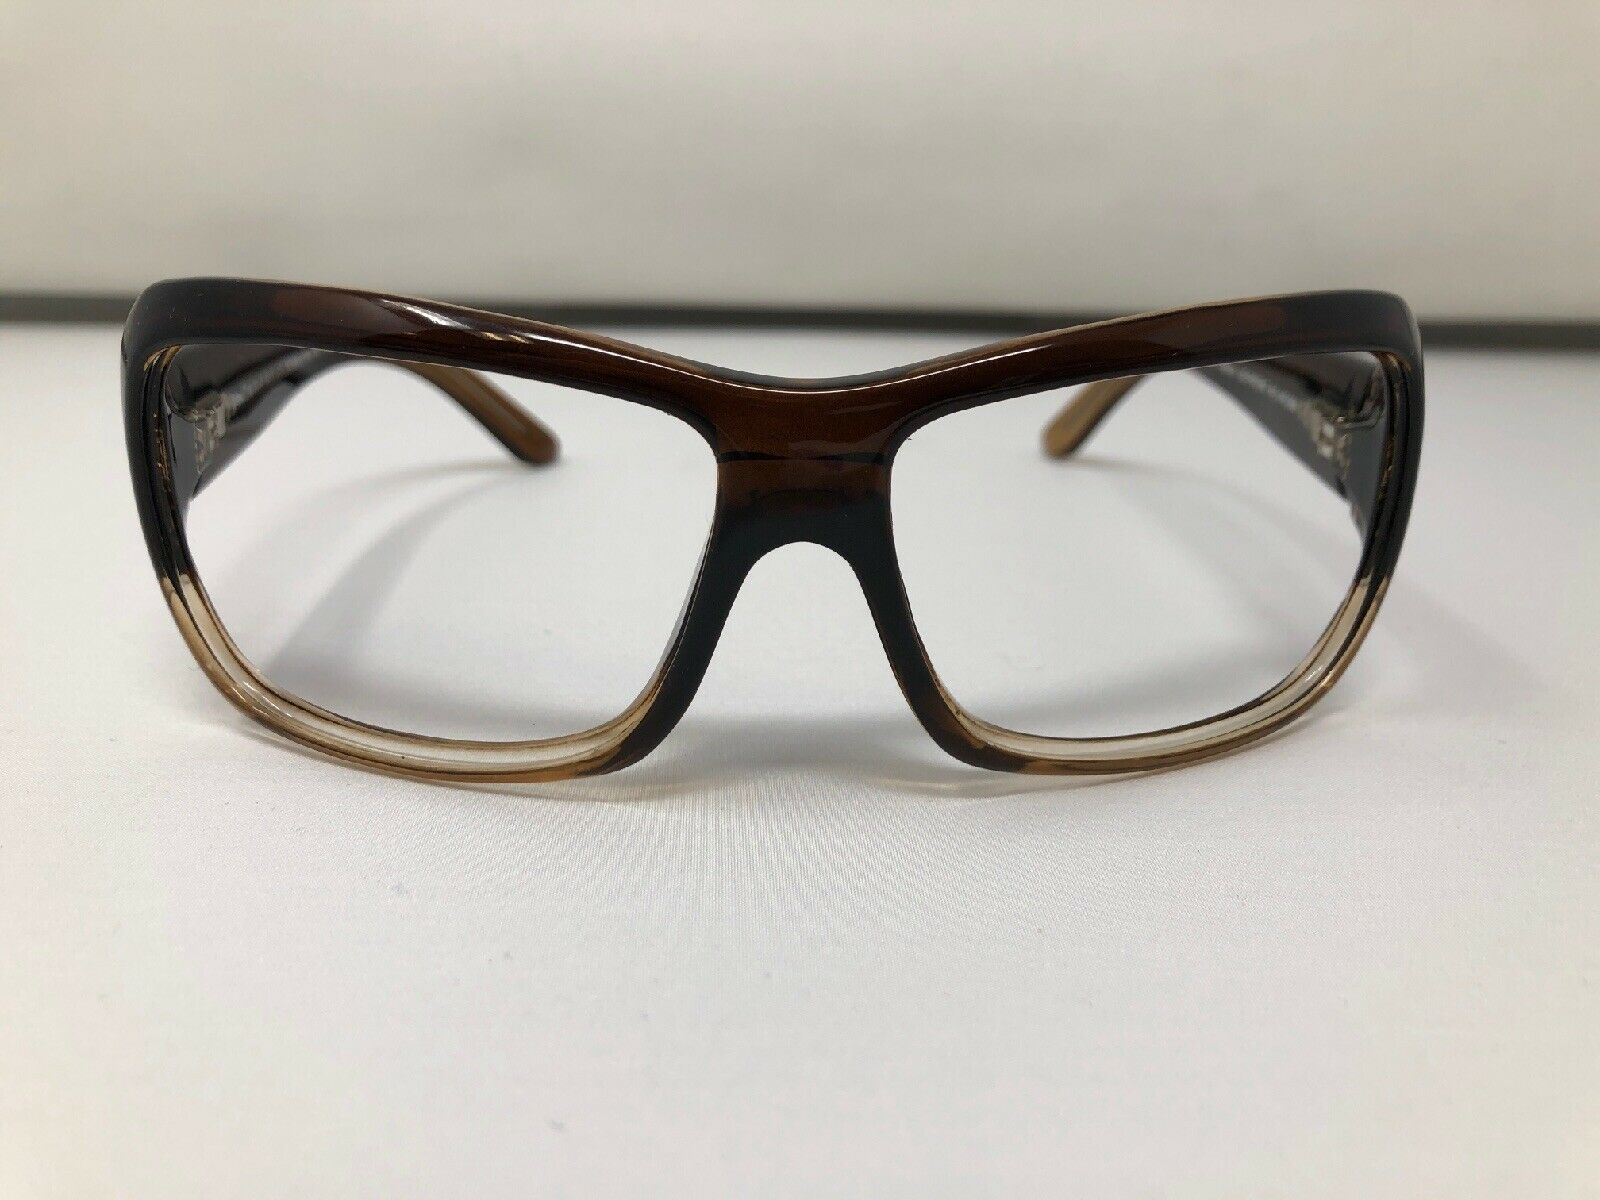 Maui Jim Sunglasses Frames PALMS 63-15-115 Brown MJ111-01 Italy KE93